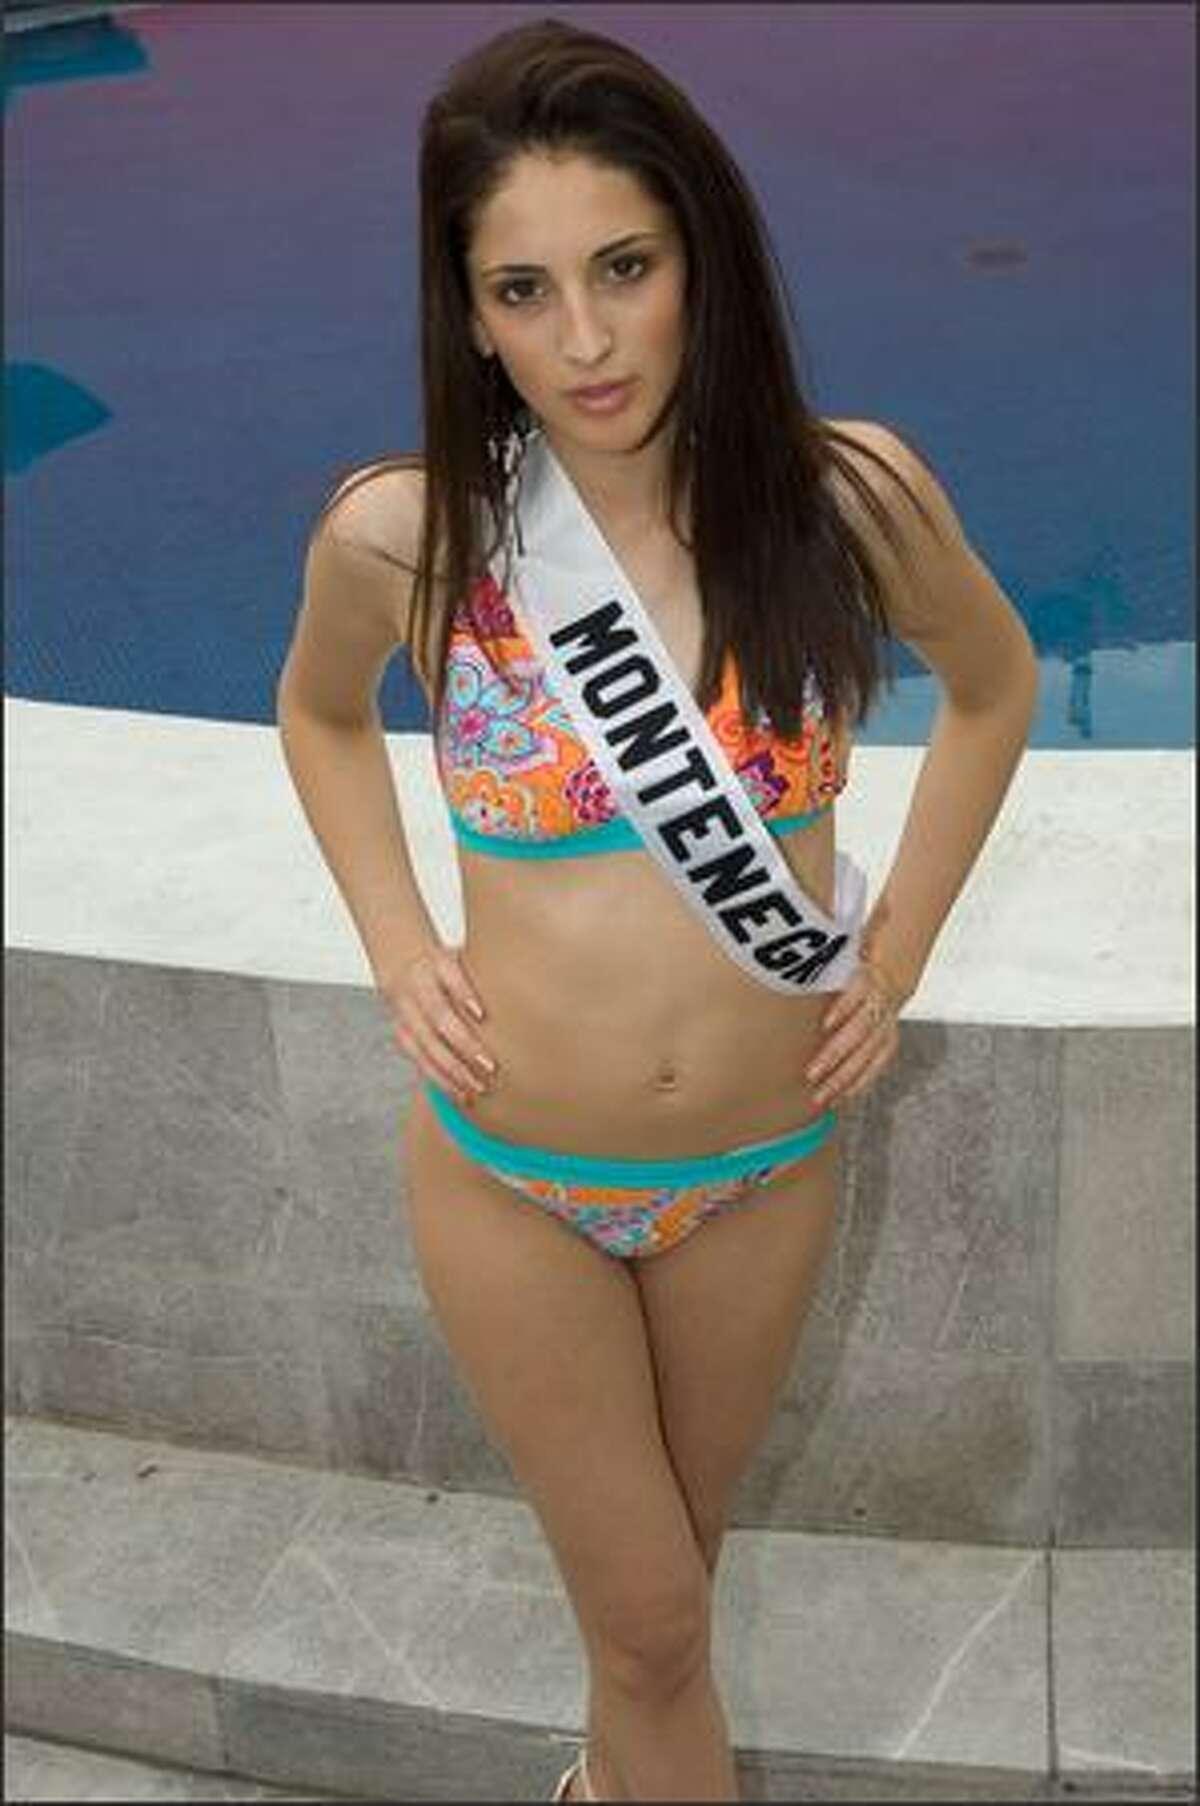 Snezana Buskovic, Miss Montenegro 2007.